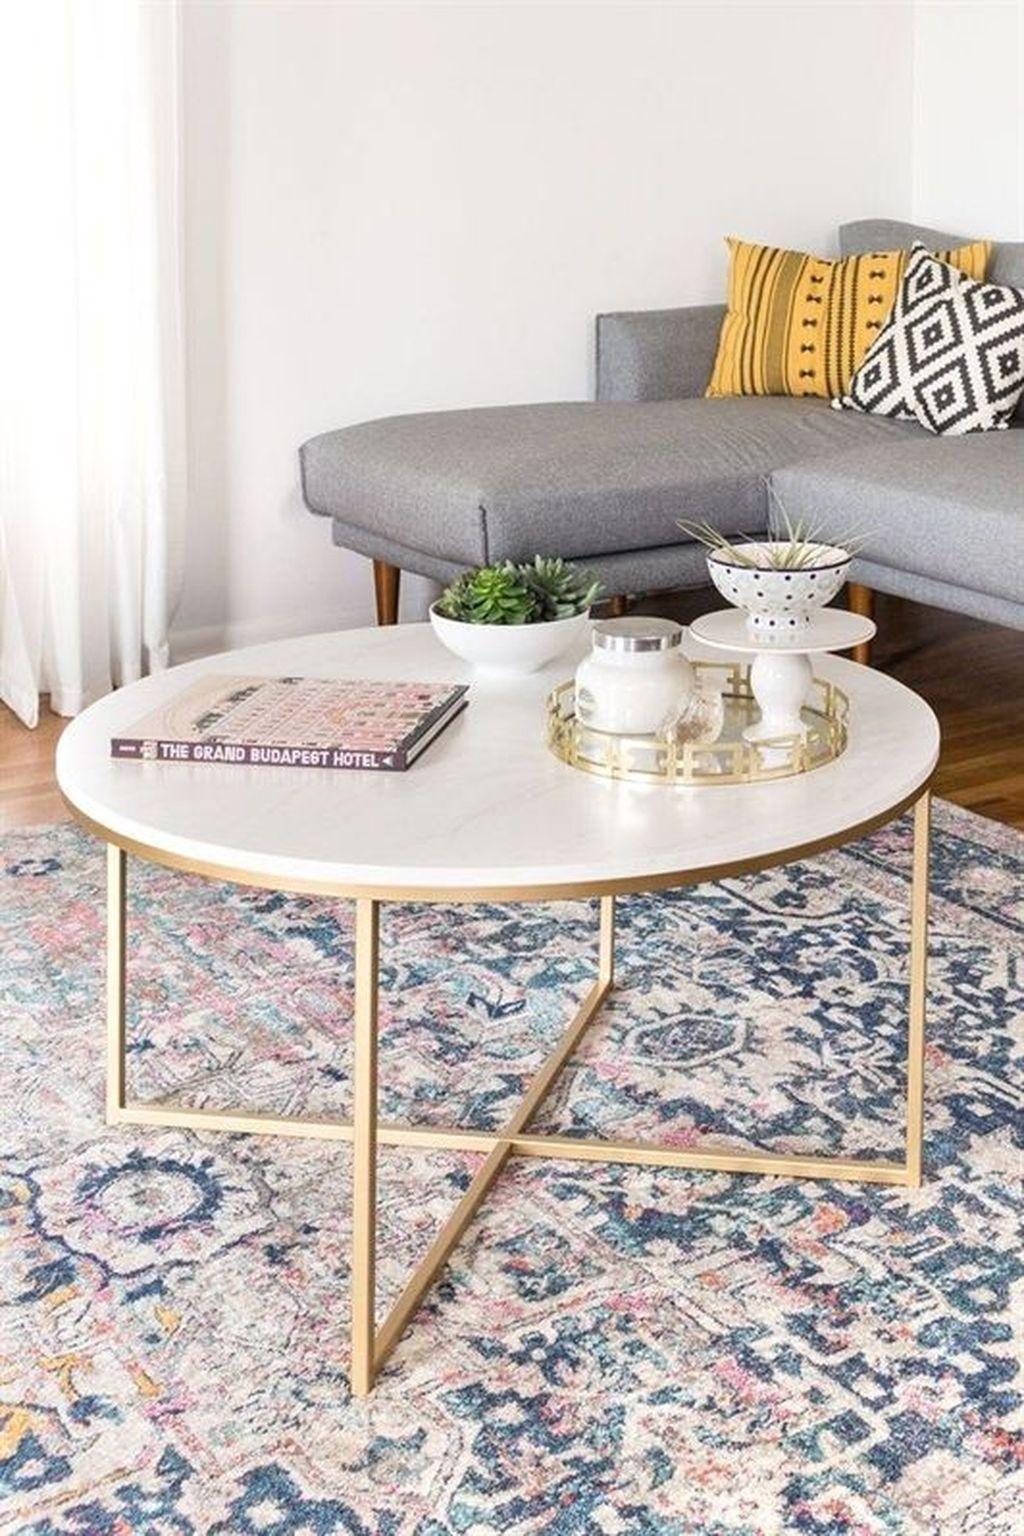 59 Simple Diy Coffe Table Decor Ideas Living Room Coffee Table Coffee Table Coffee Table Design [ 1536 x 1024 Pixel ]